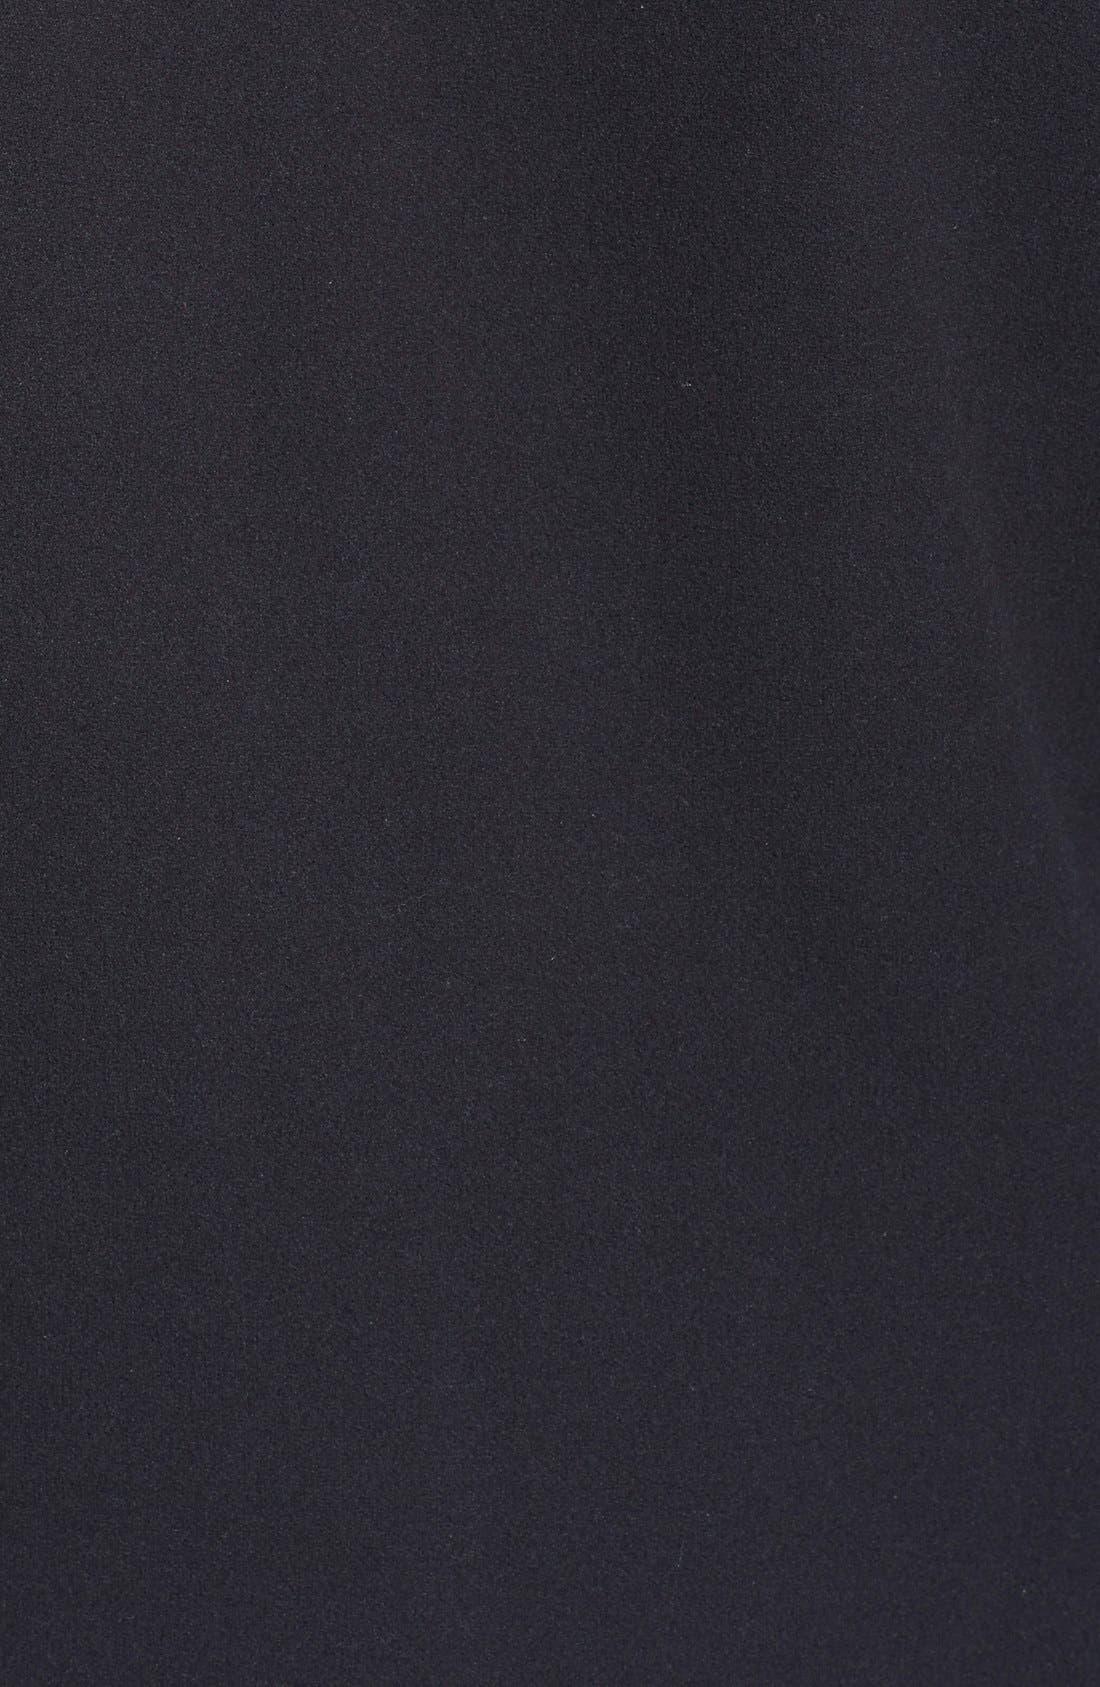 'Chimborazo' Zip Front Fleece Jacket,                             Alternate thumbnail 27, color,